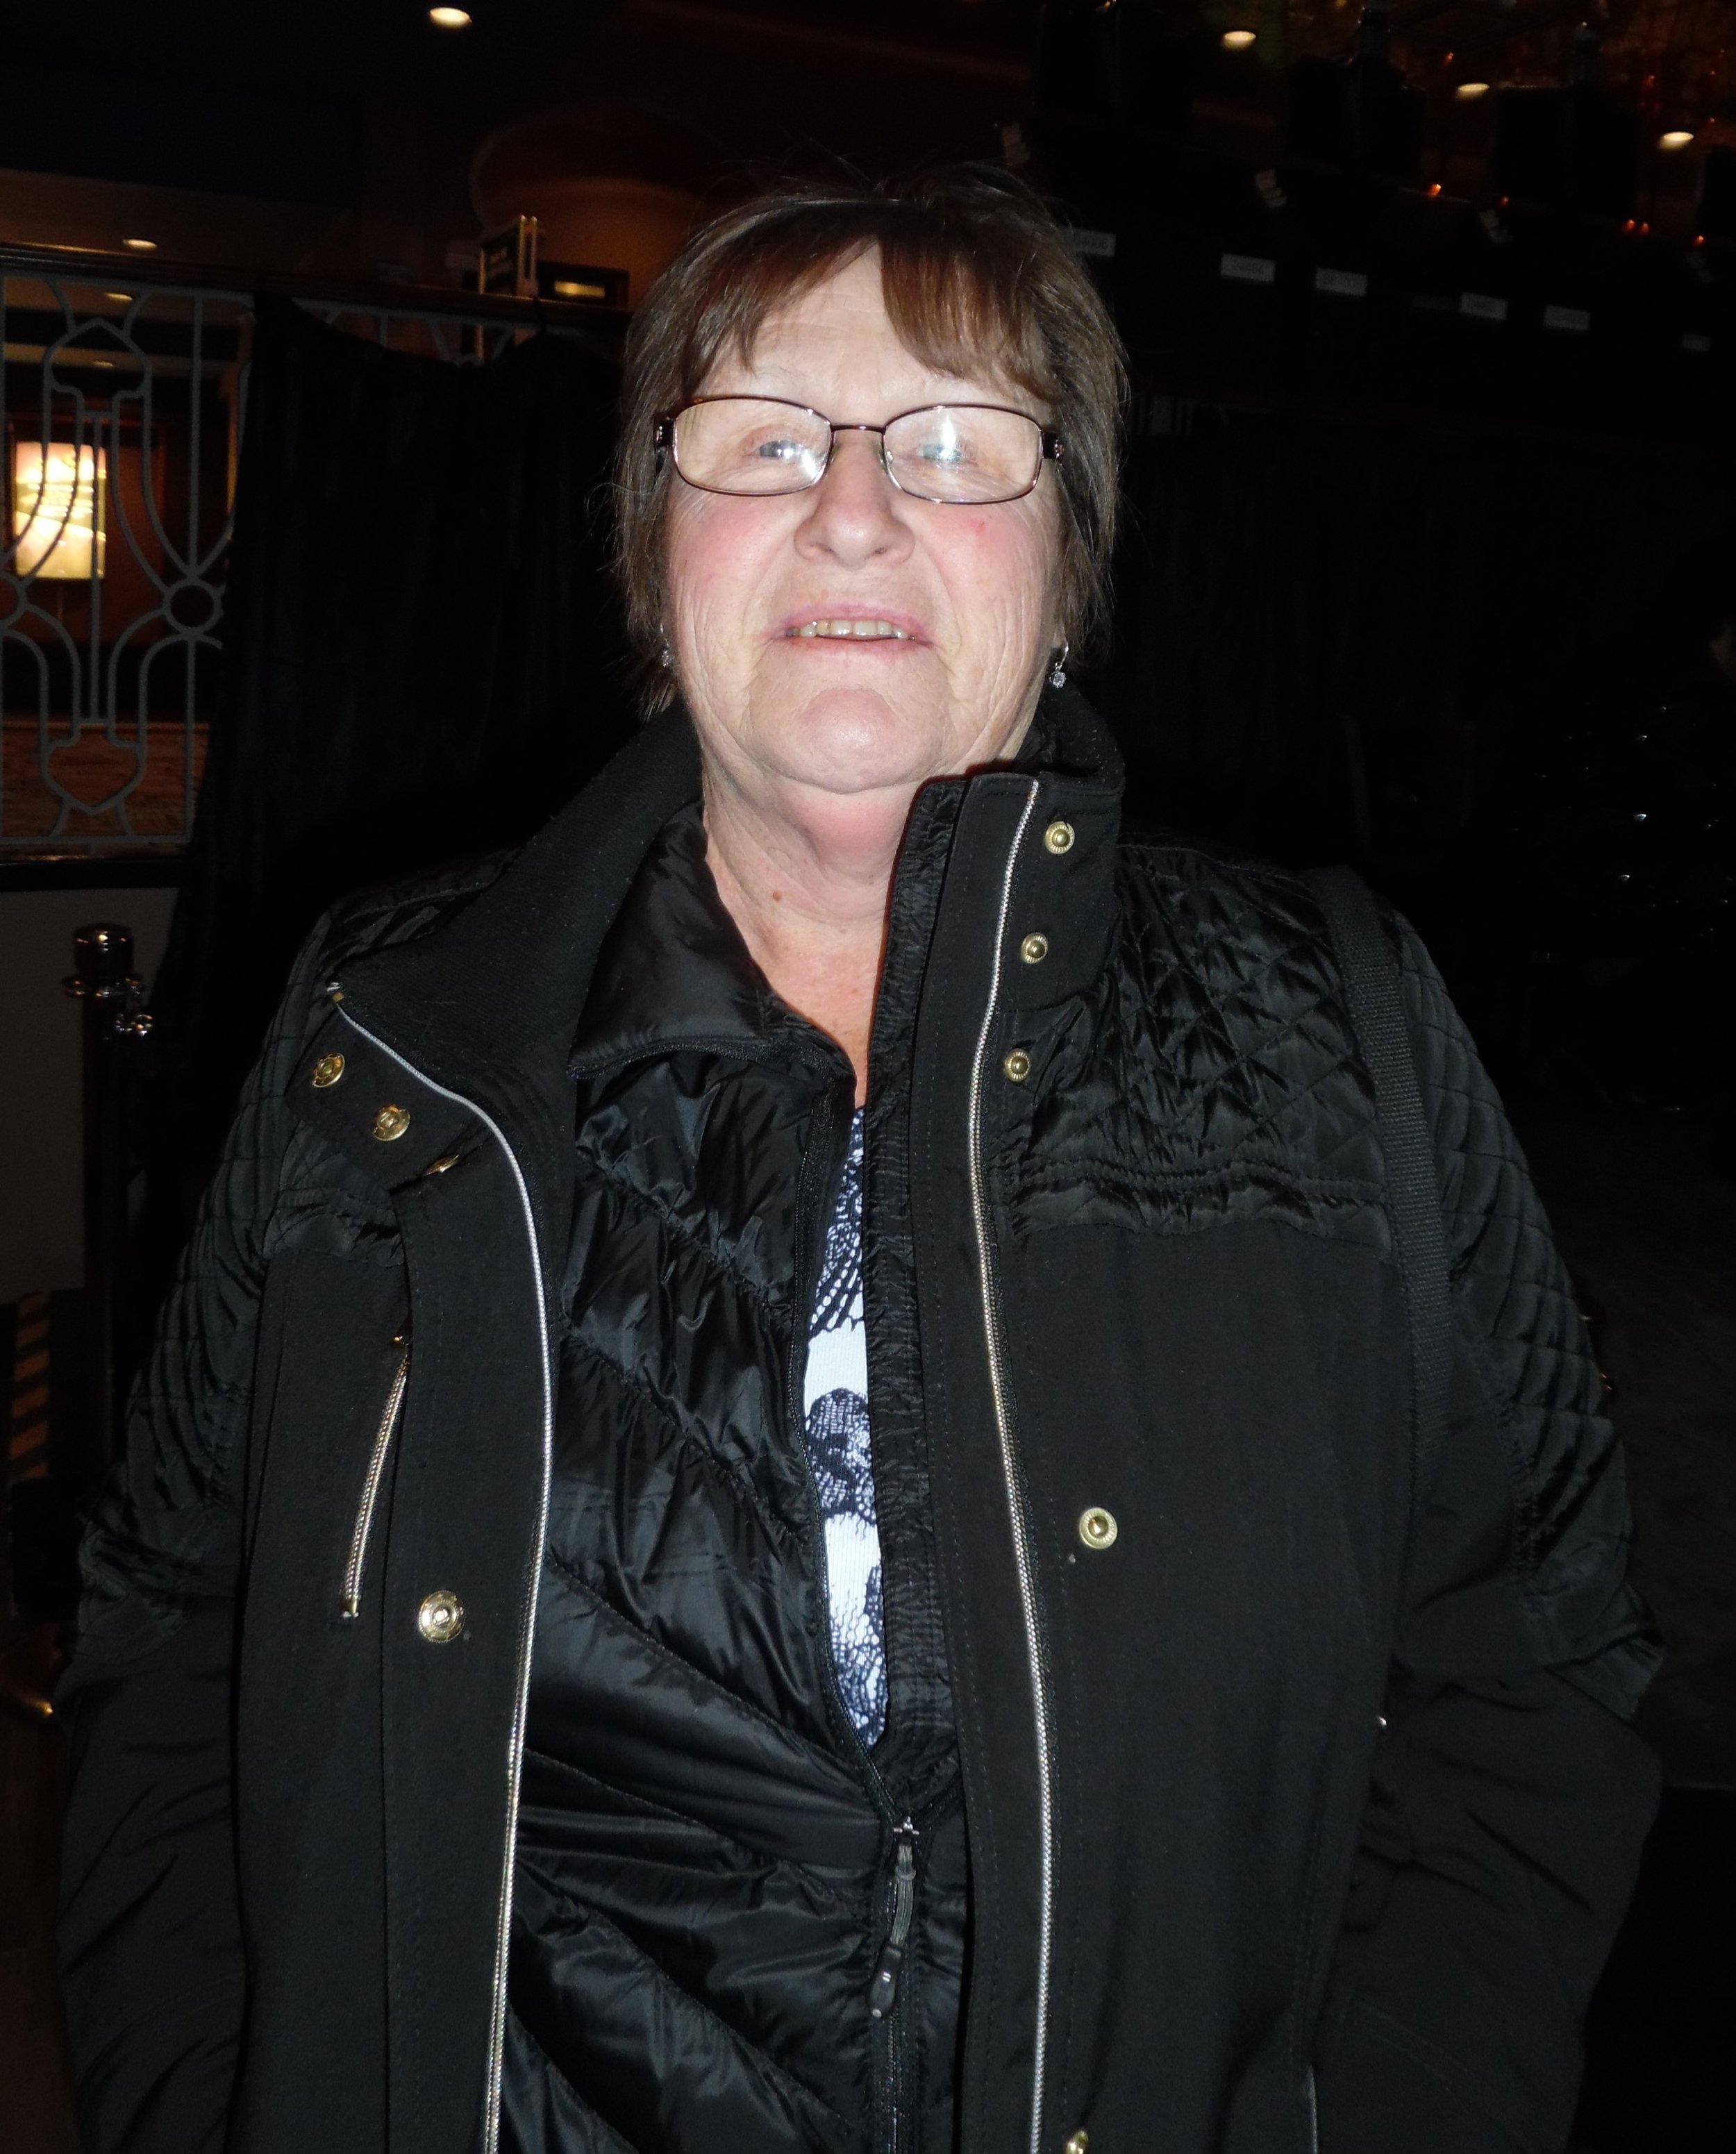 ETA fan Donna Young, January 5th, 2018 at Flamboro Downs.